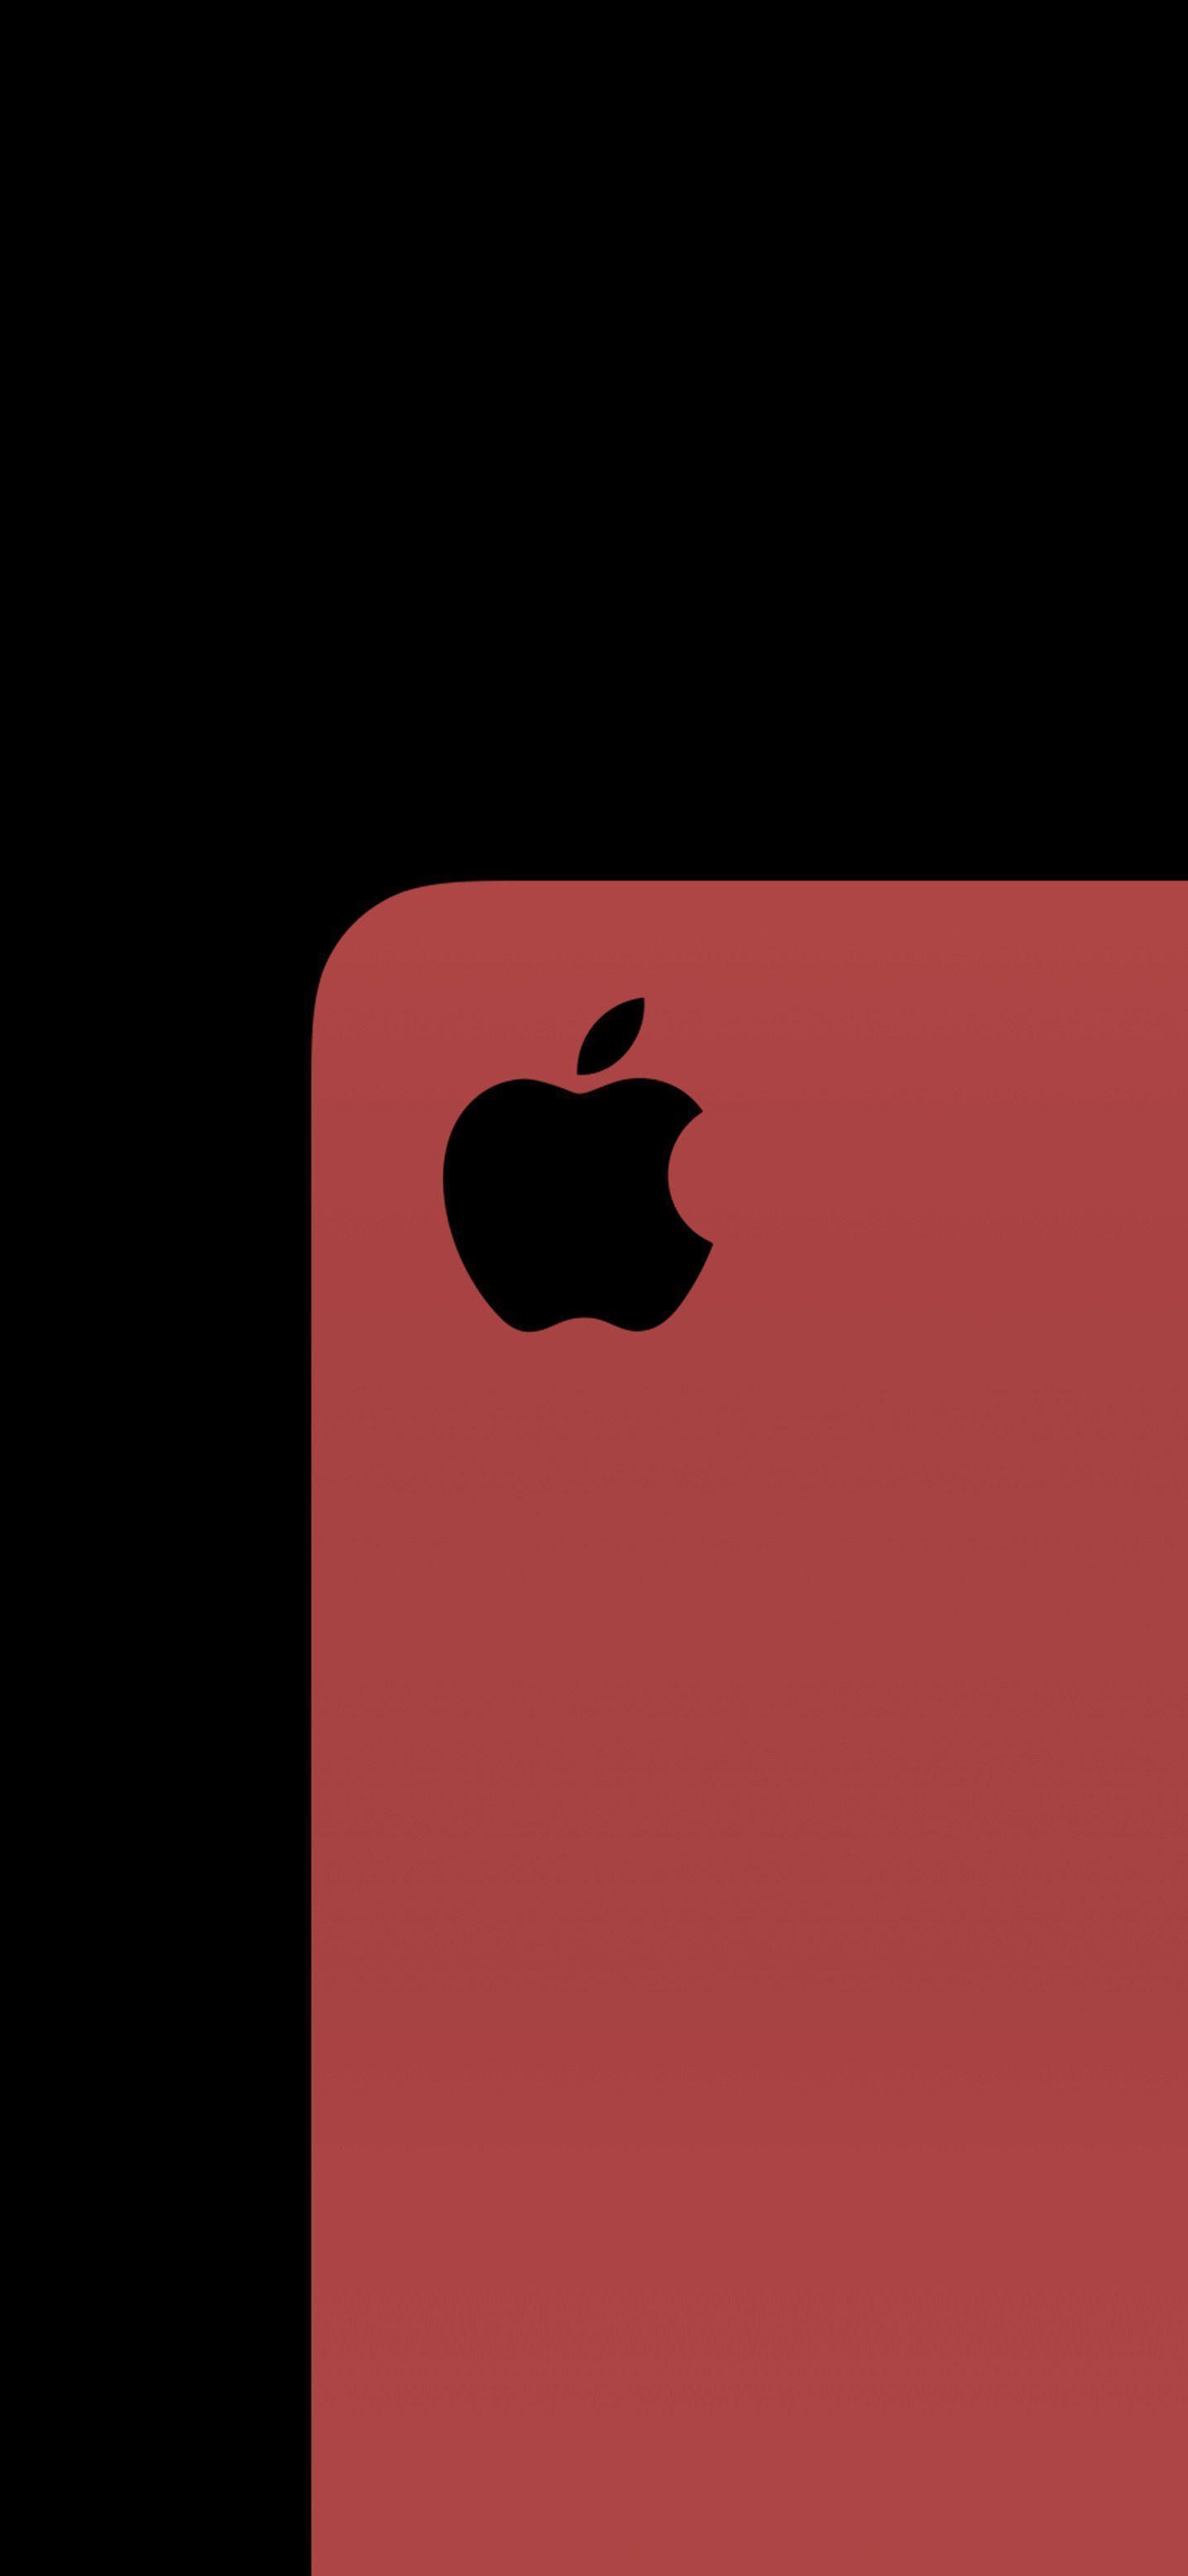 Iphonewallpaper Red Hintergrundbildiphone Tapete Apple Logo Red Ios13wallpaper Ios13 Iphonewallpa In 2020 Apple Logo Wallpaper Iphone Apple Logo Design Apple Logo